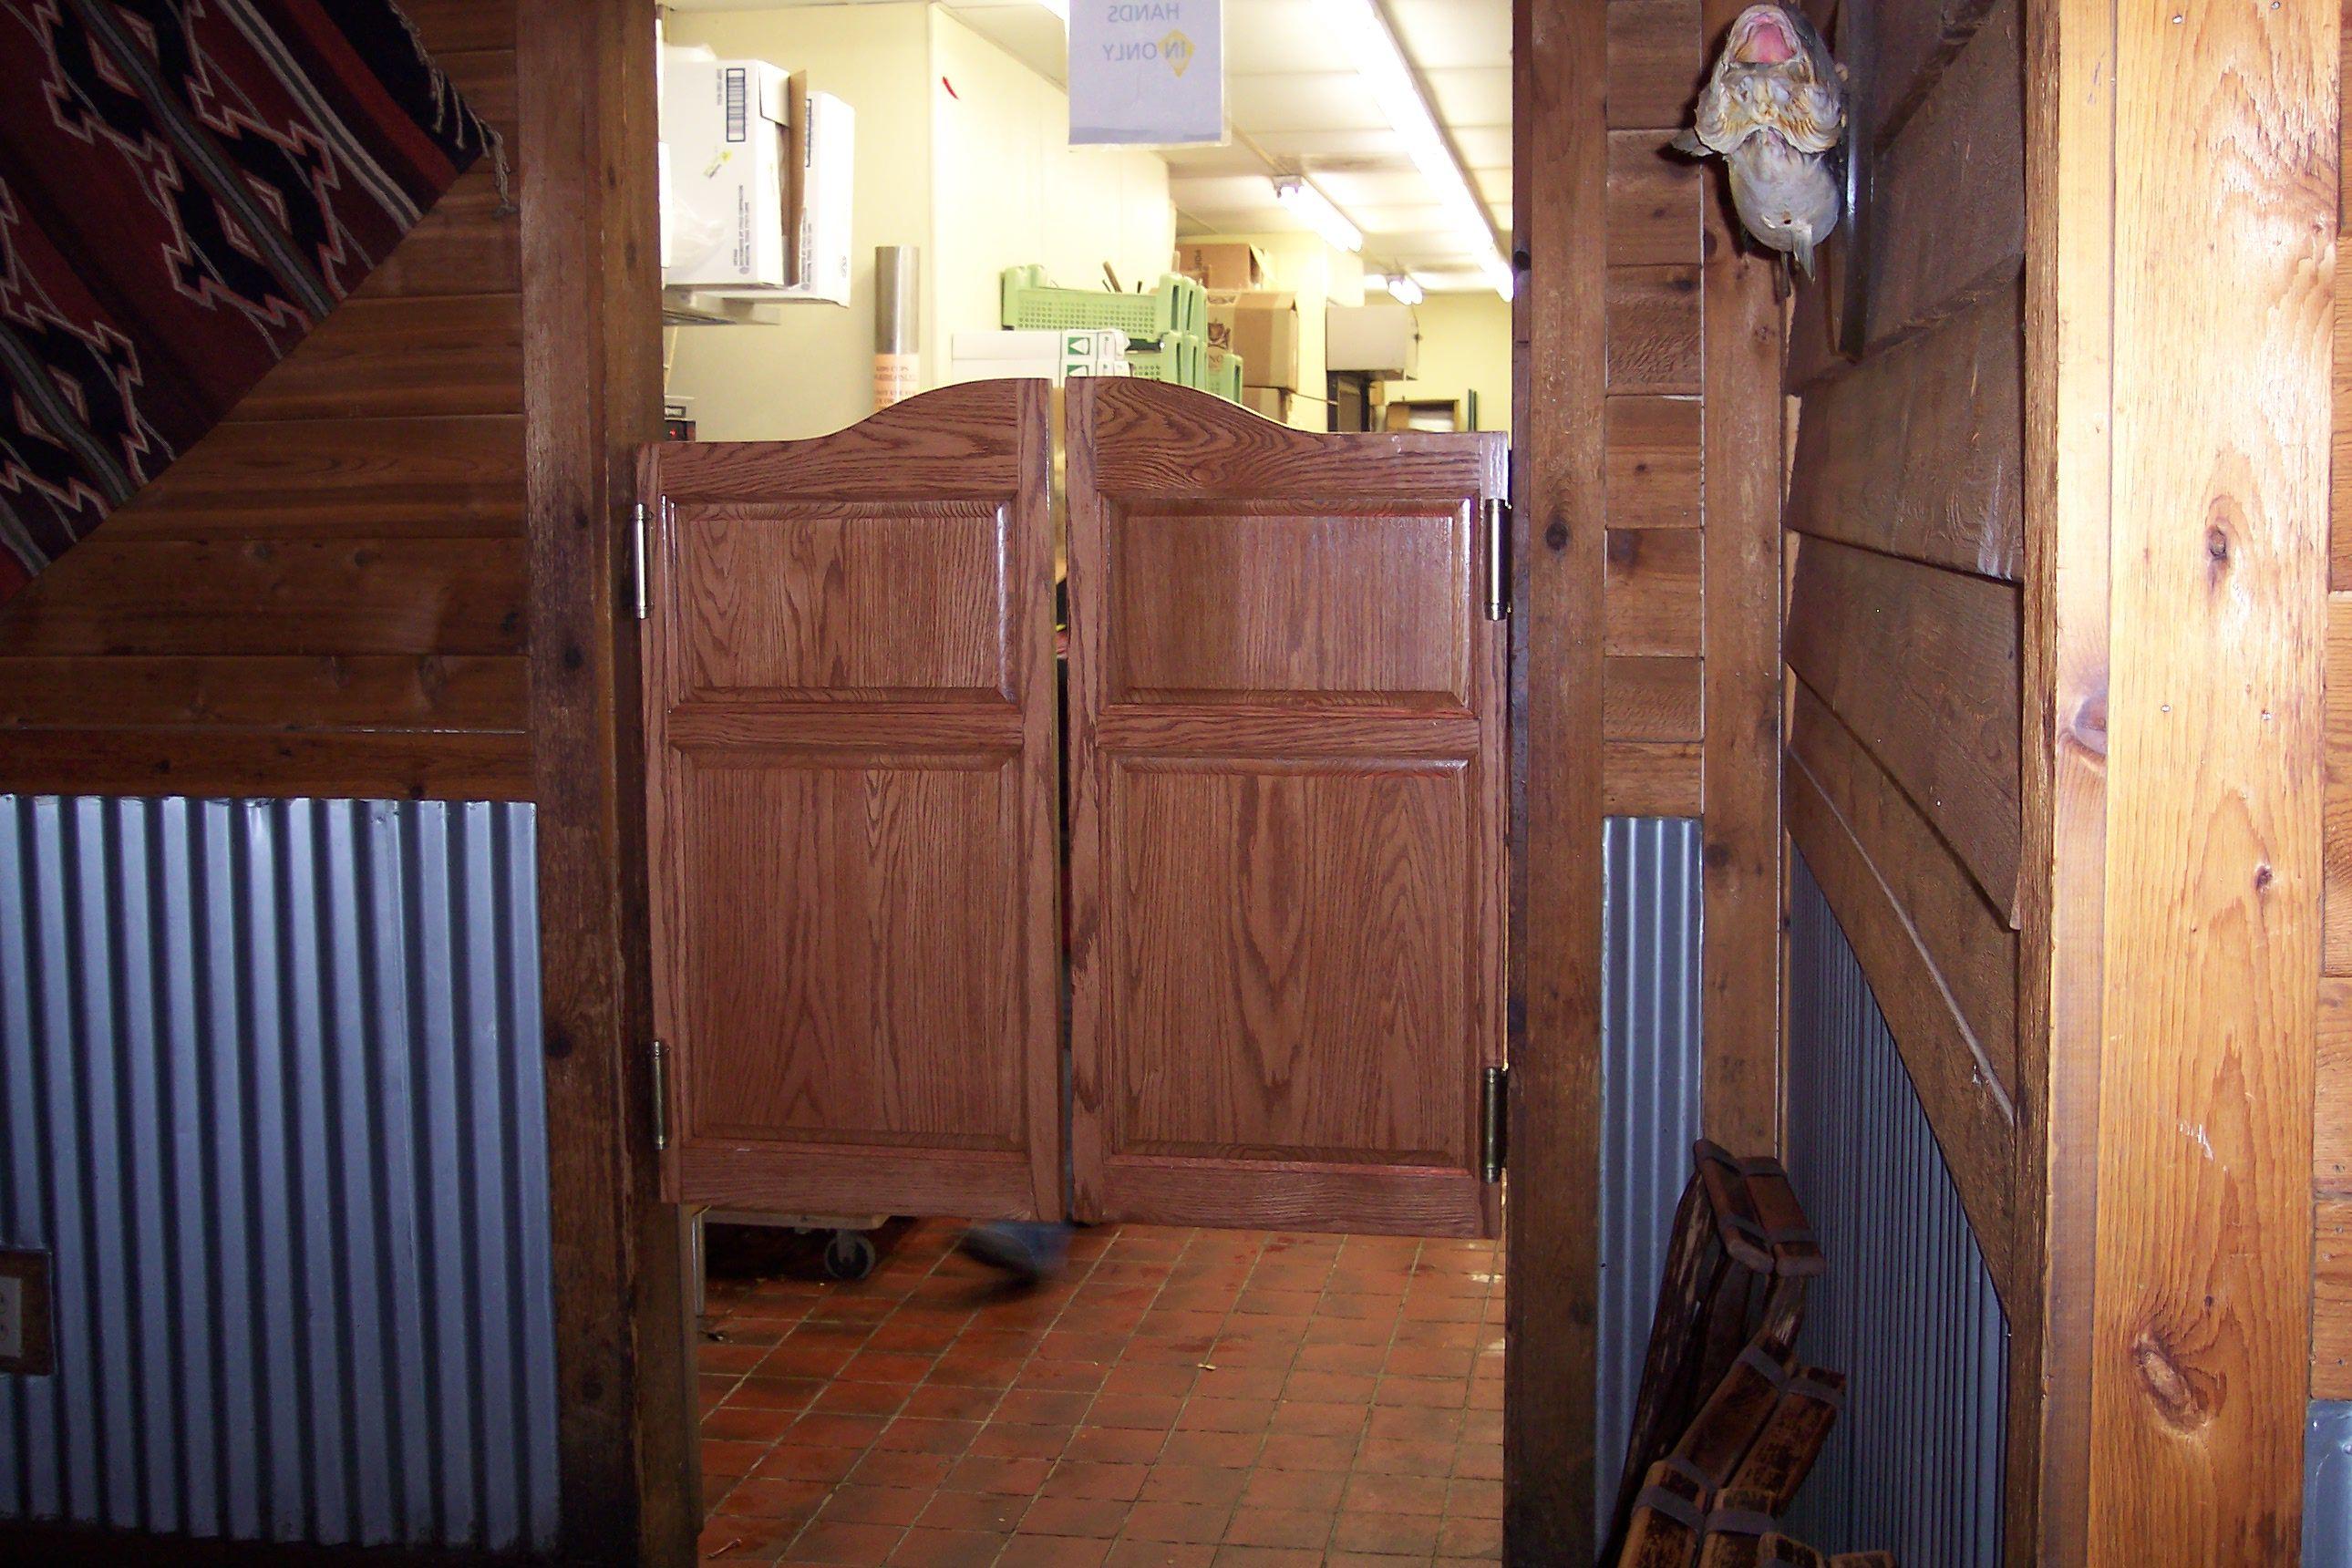 Swing Doors For Restaurants Bars Pubs Taverns Hotels Sports Bar